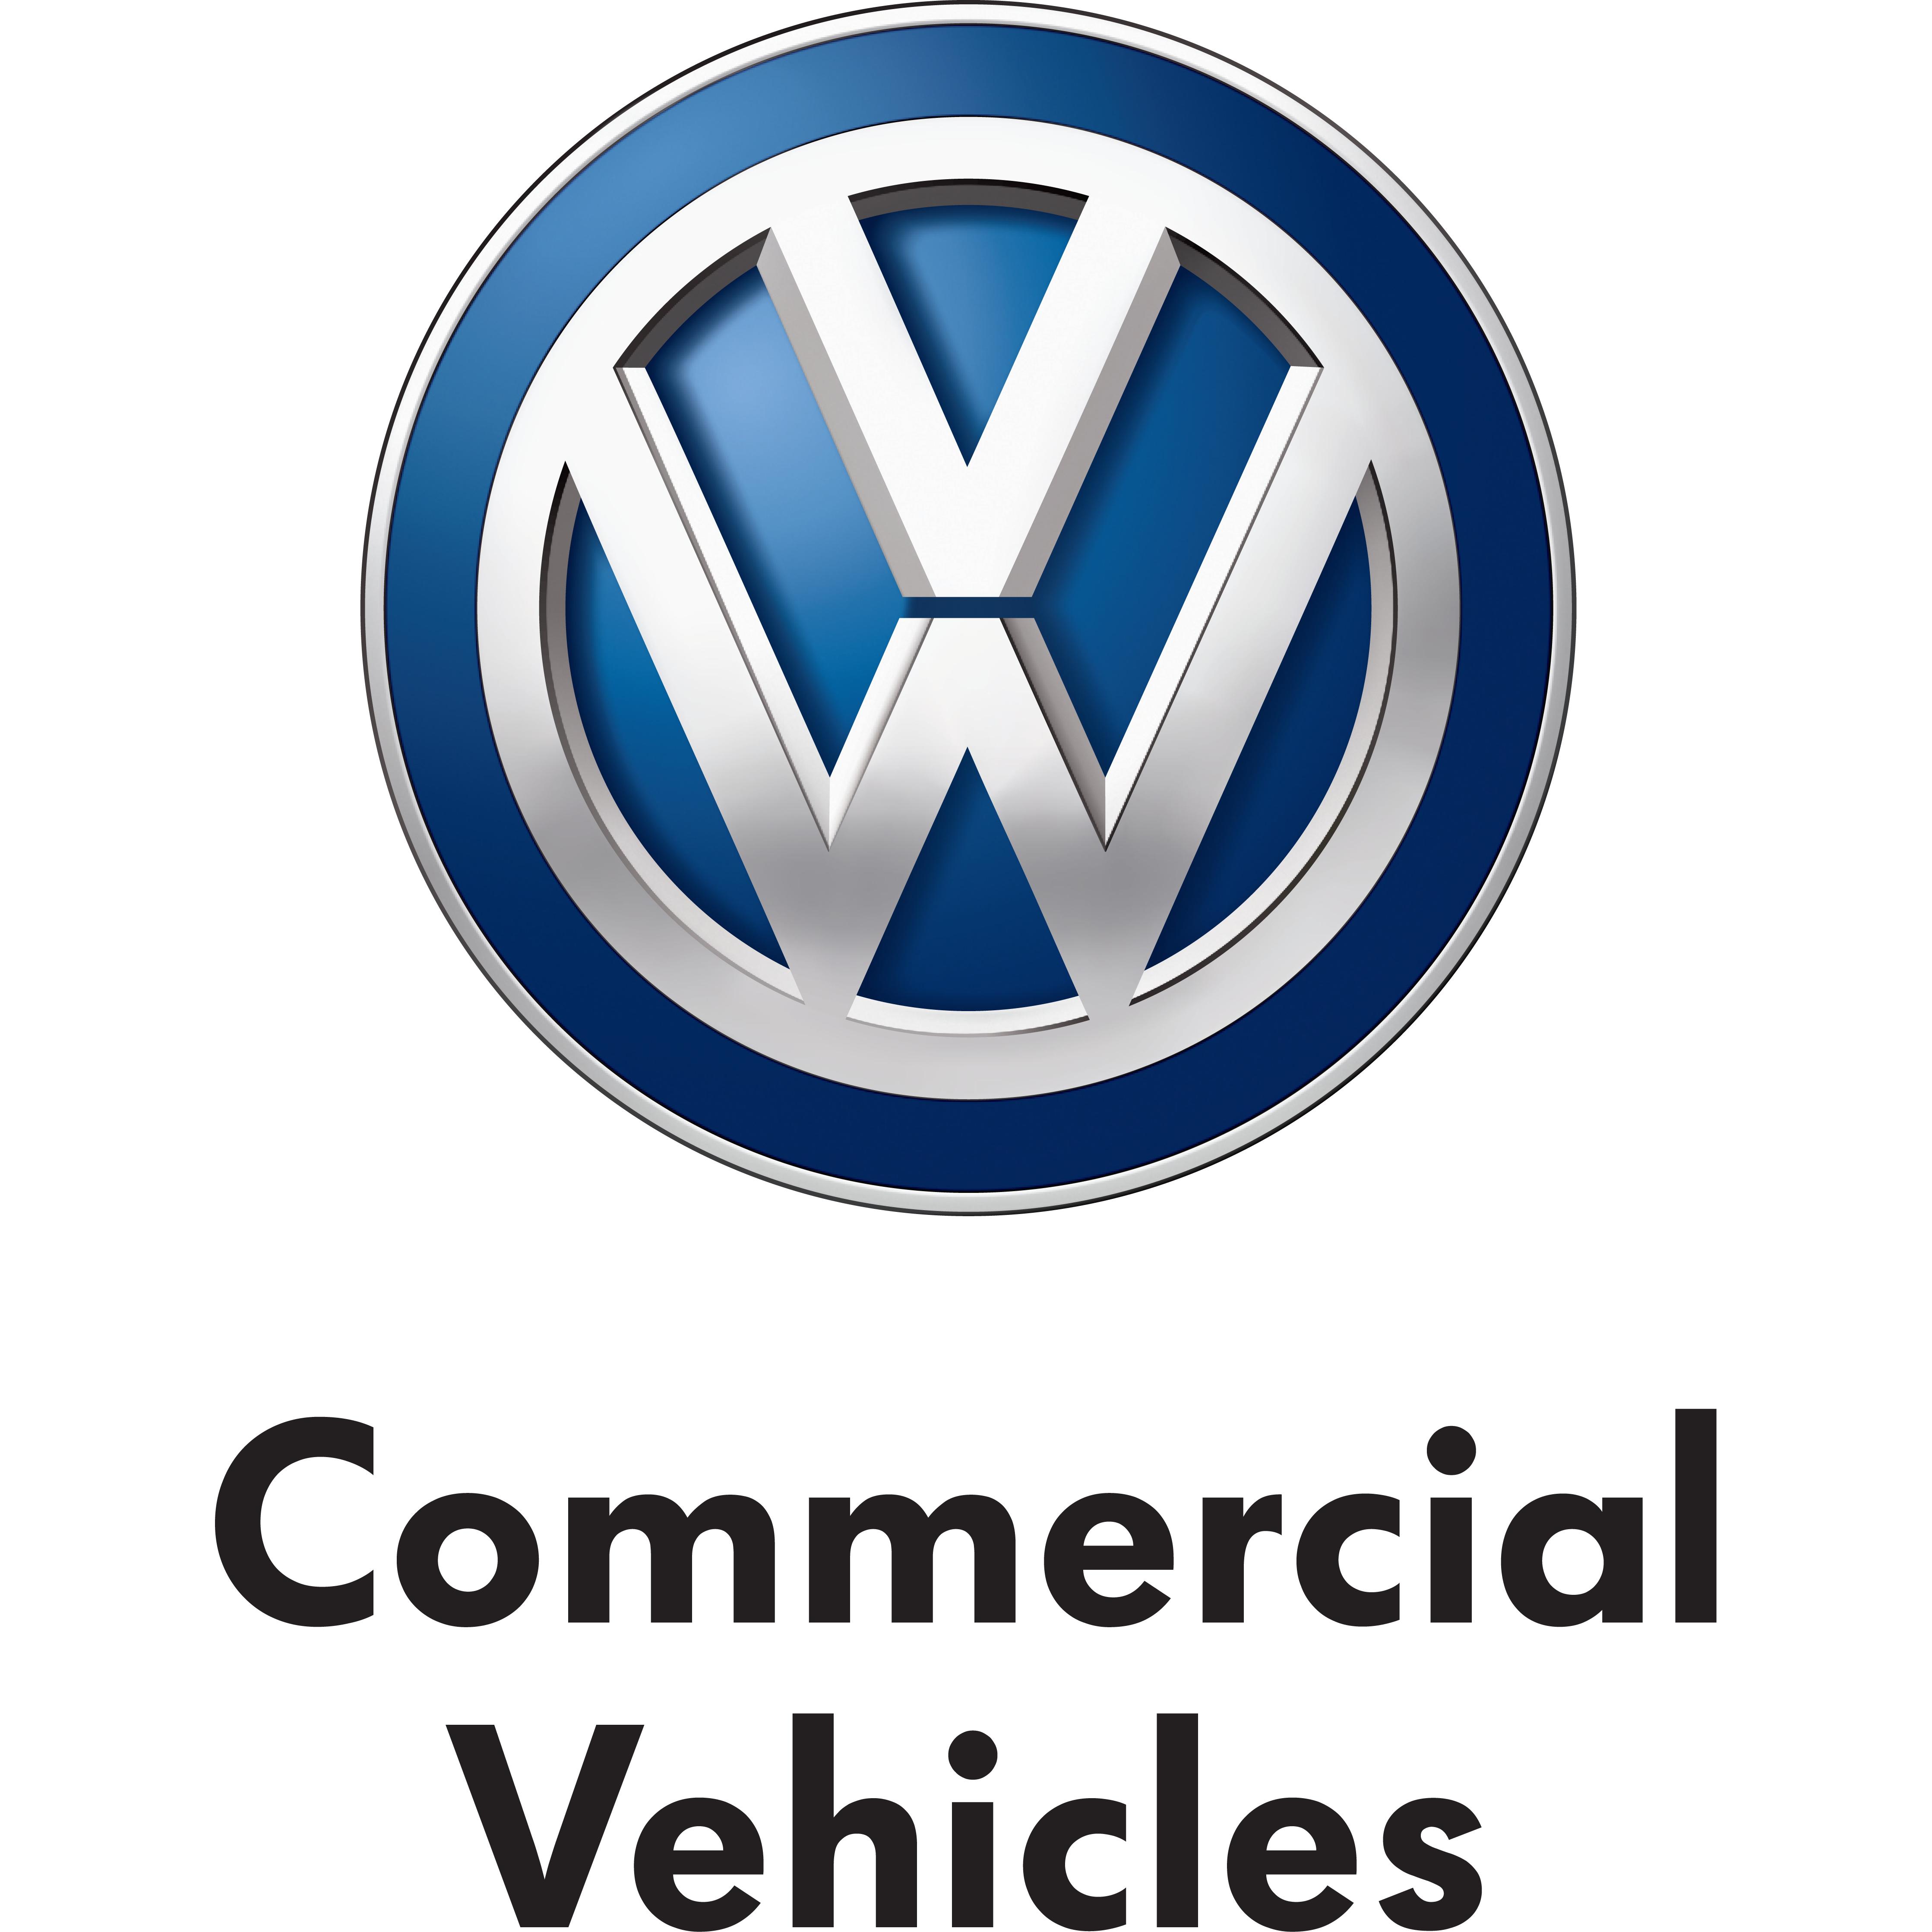 North Wales Volkswagen Van Centre - North Wales, Gwynedd LL31 9AY - 01492 585700 | ShowMeLocal.com